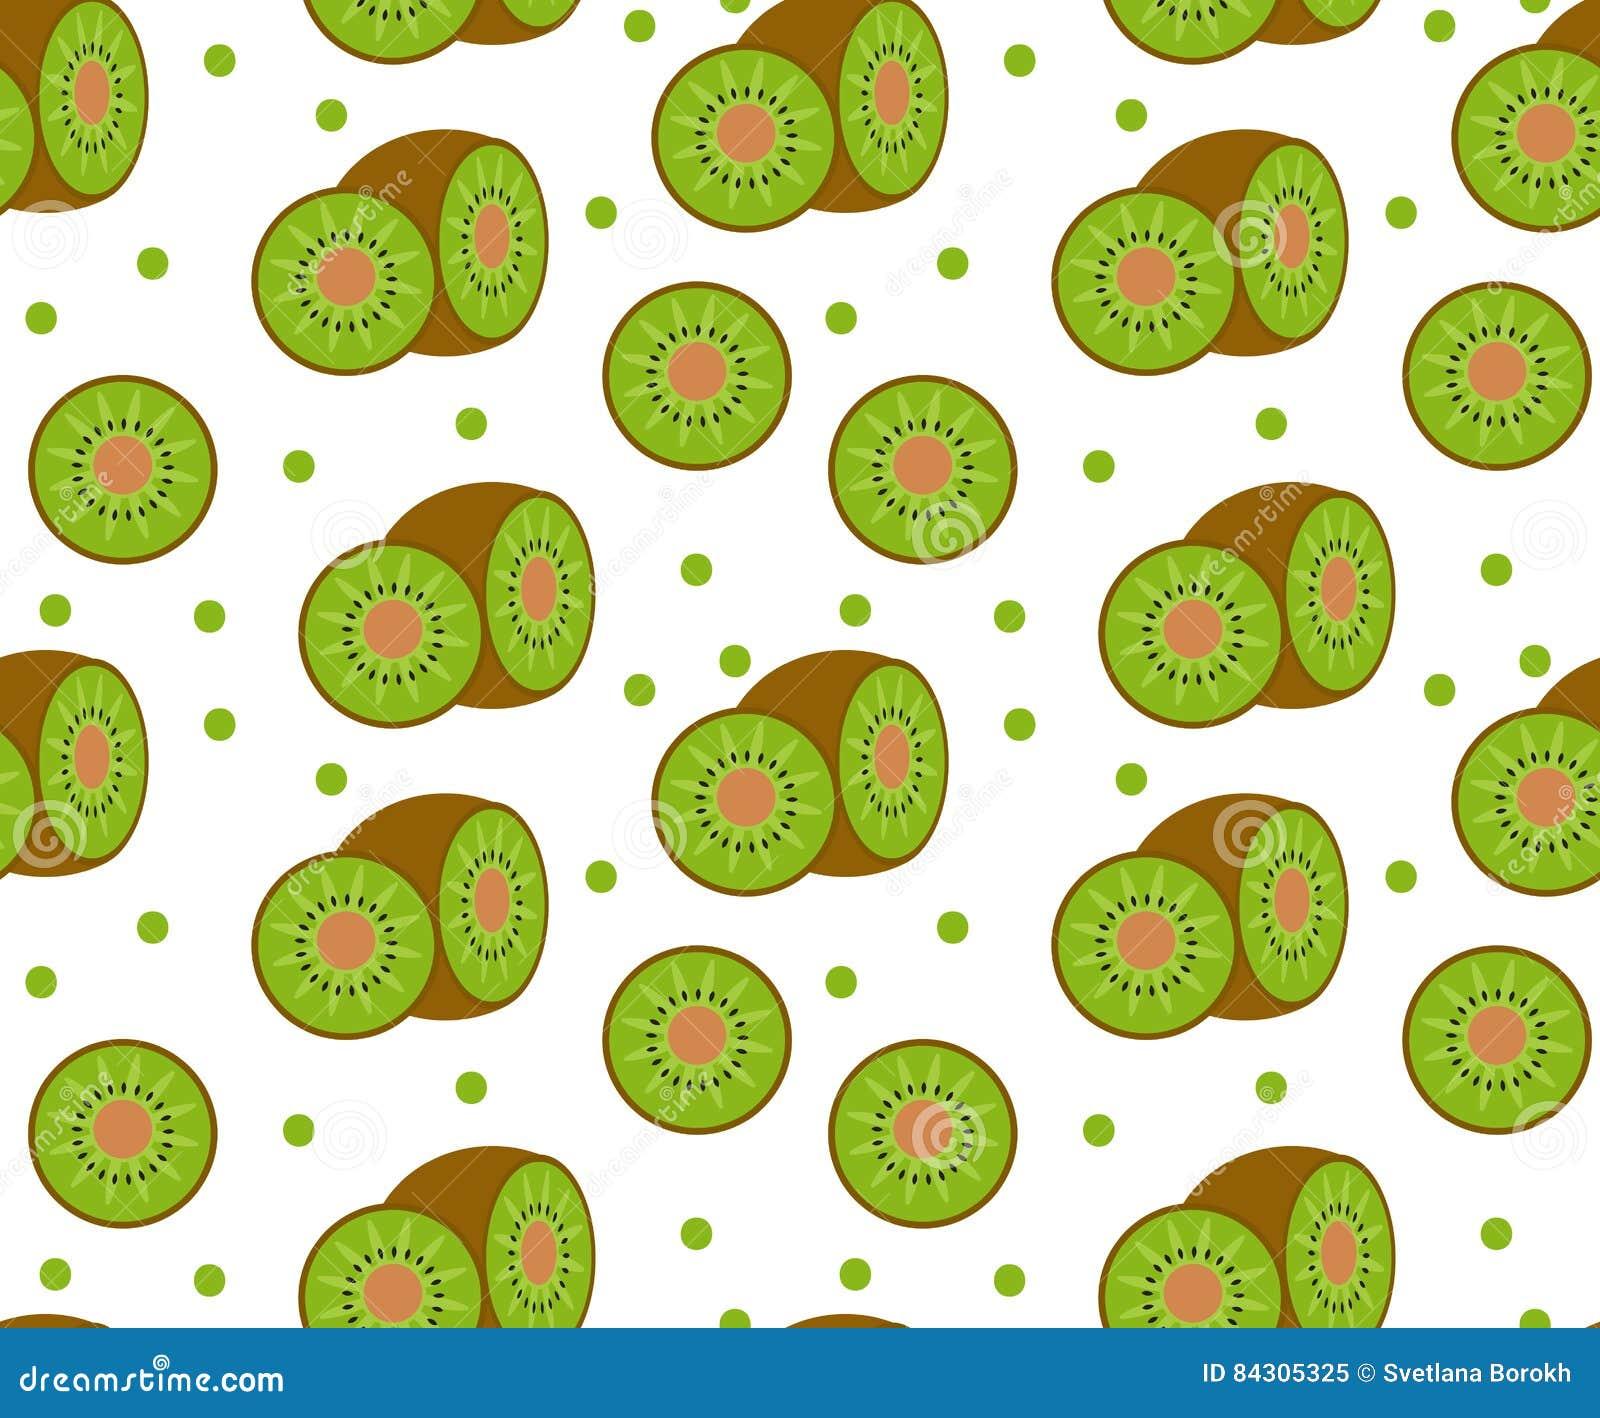 Kiwi seamless pattern. Kiwifruit endless background, texture. Fruits backdrop.